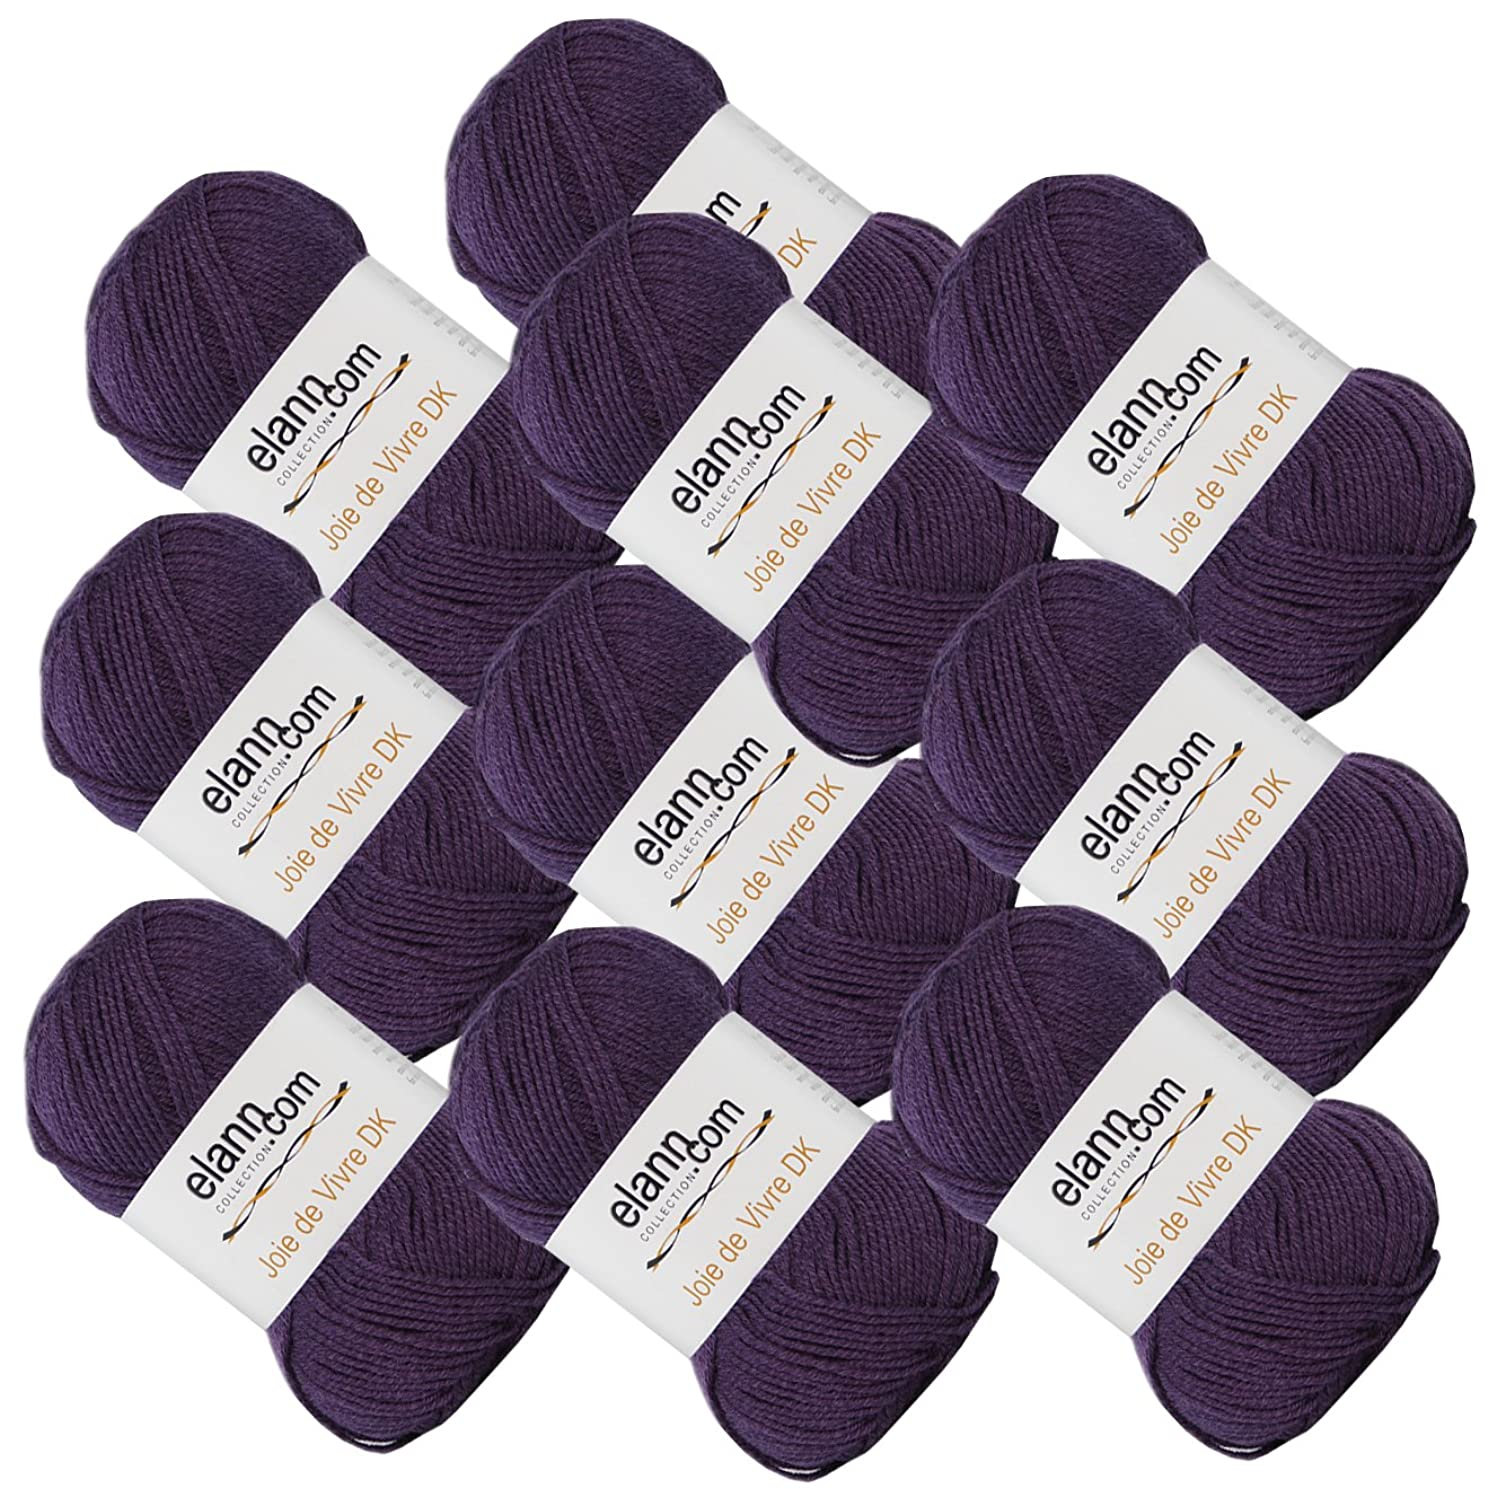 elann Joie de Vivre DK Yarn   10 Ball Bag   04 Plum Purple